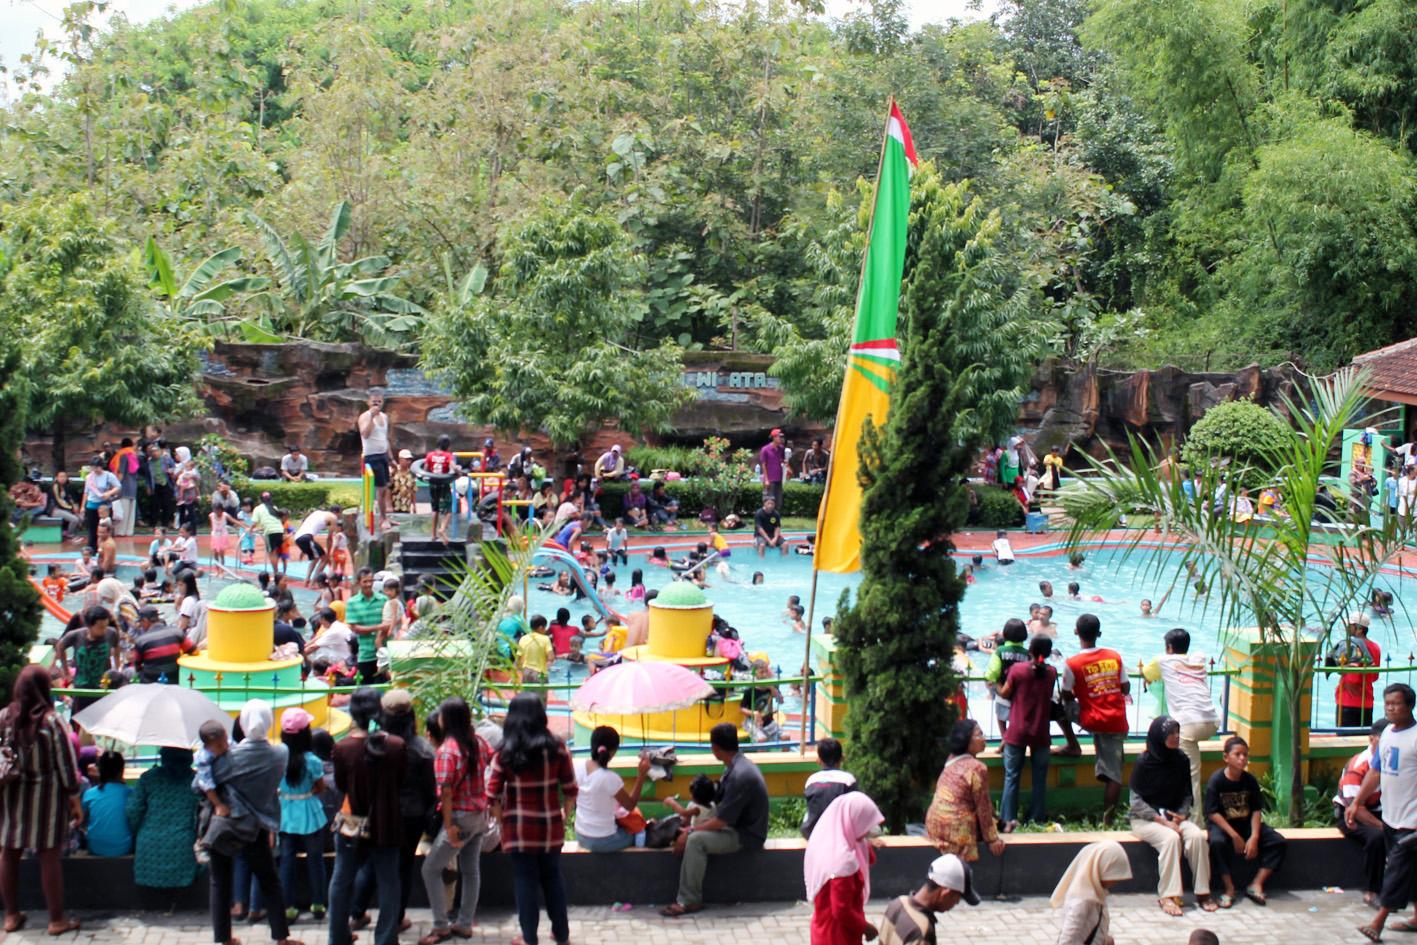 Ngembag Water Park Wisata Ponorogo 2 Km Menuju Arah Pulung